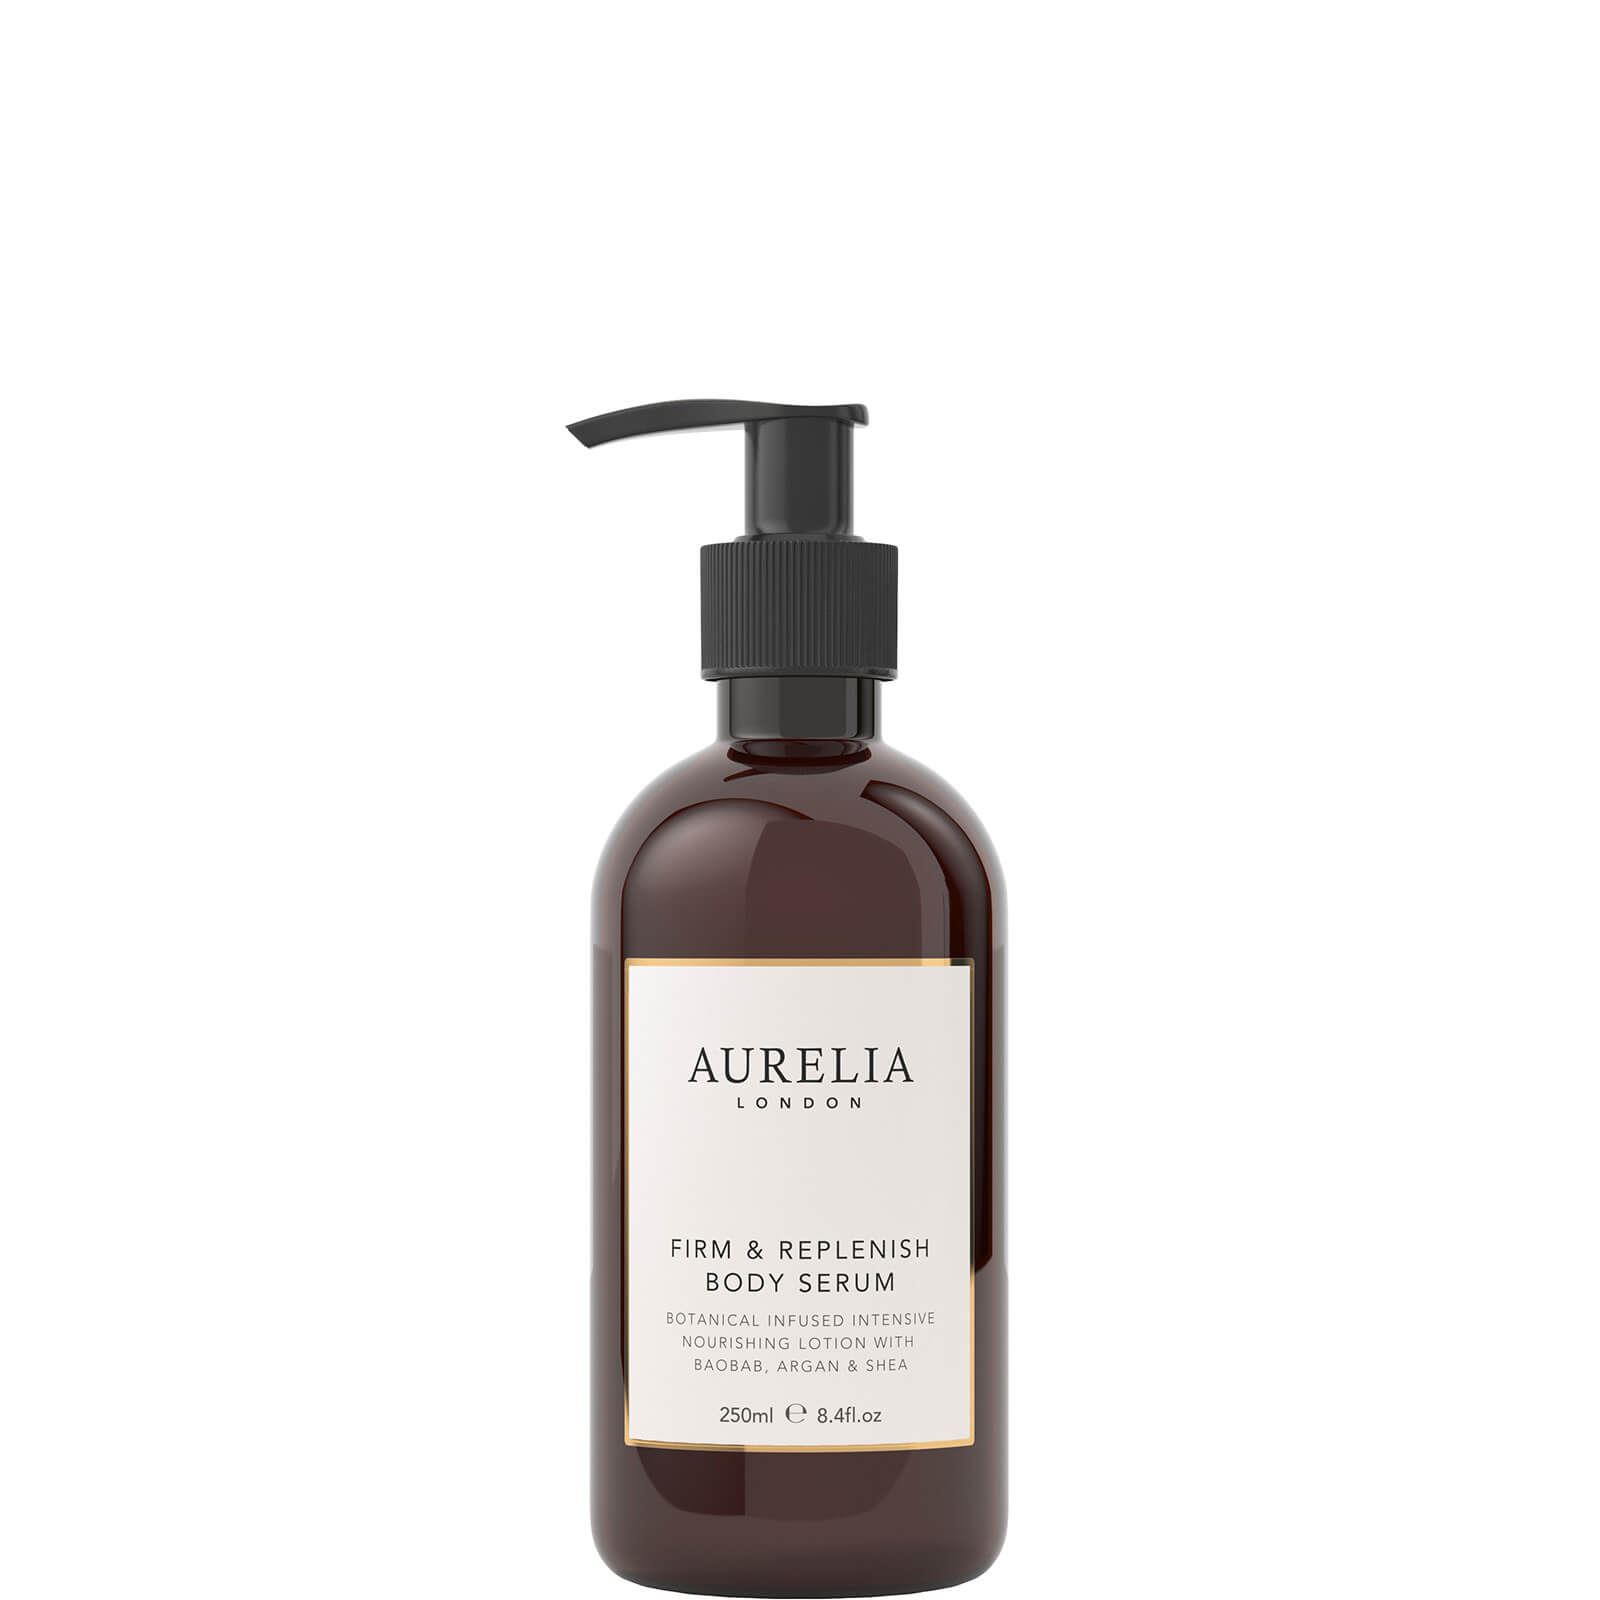 Aurelia London Firm & Replenish Body Serum 250ml